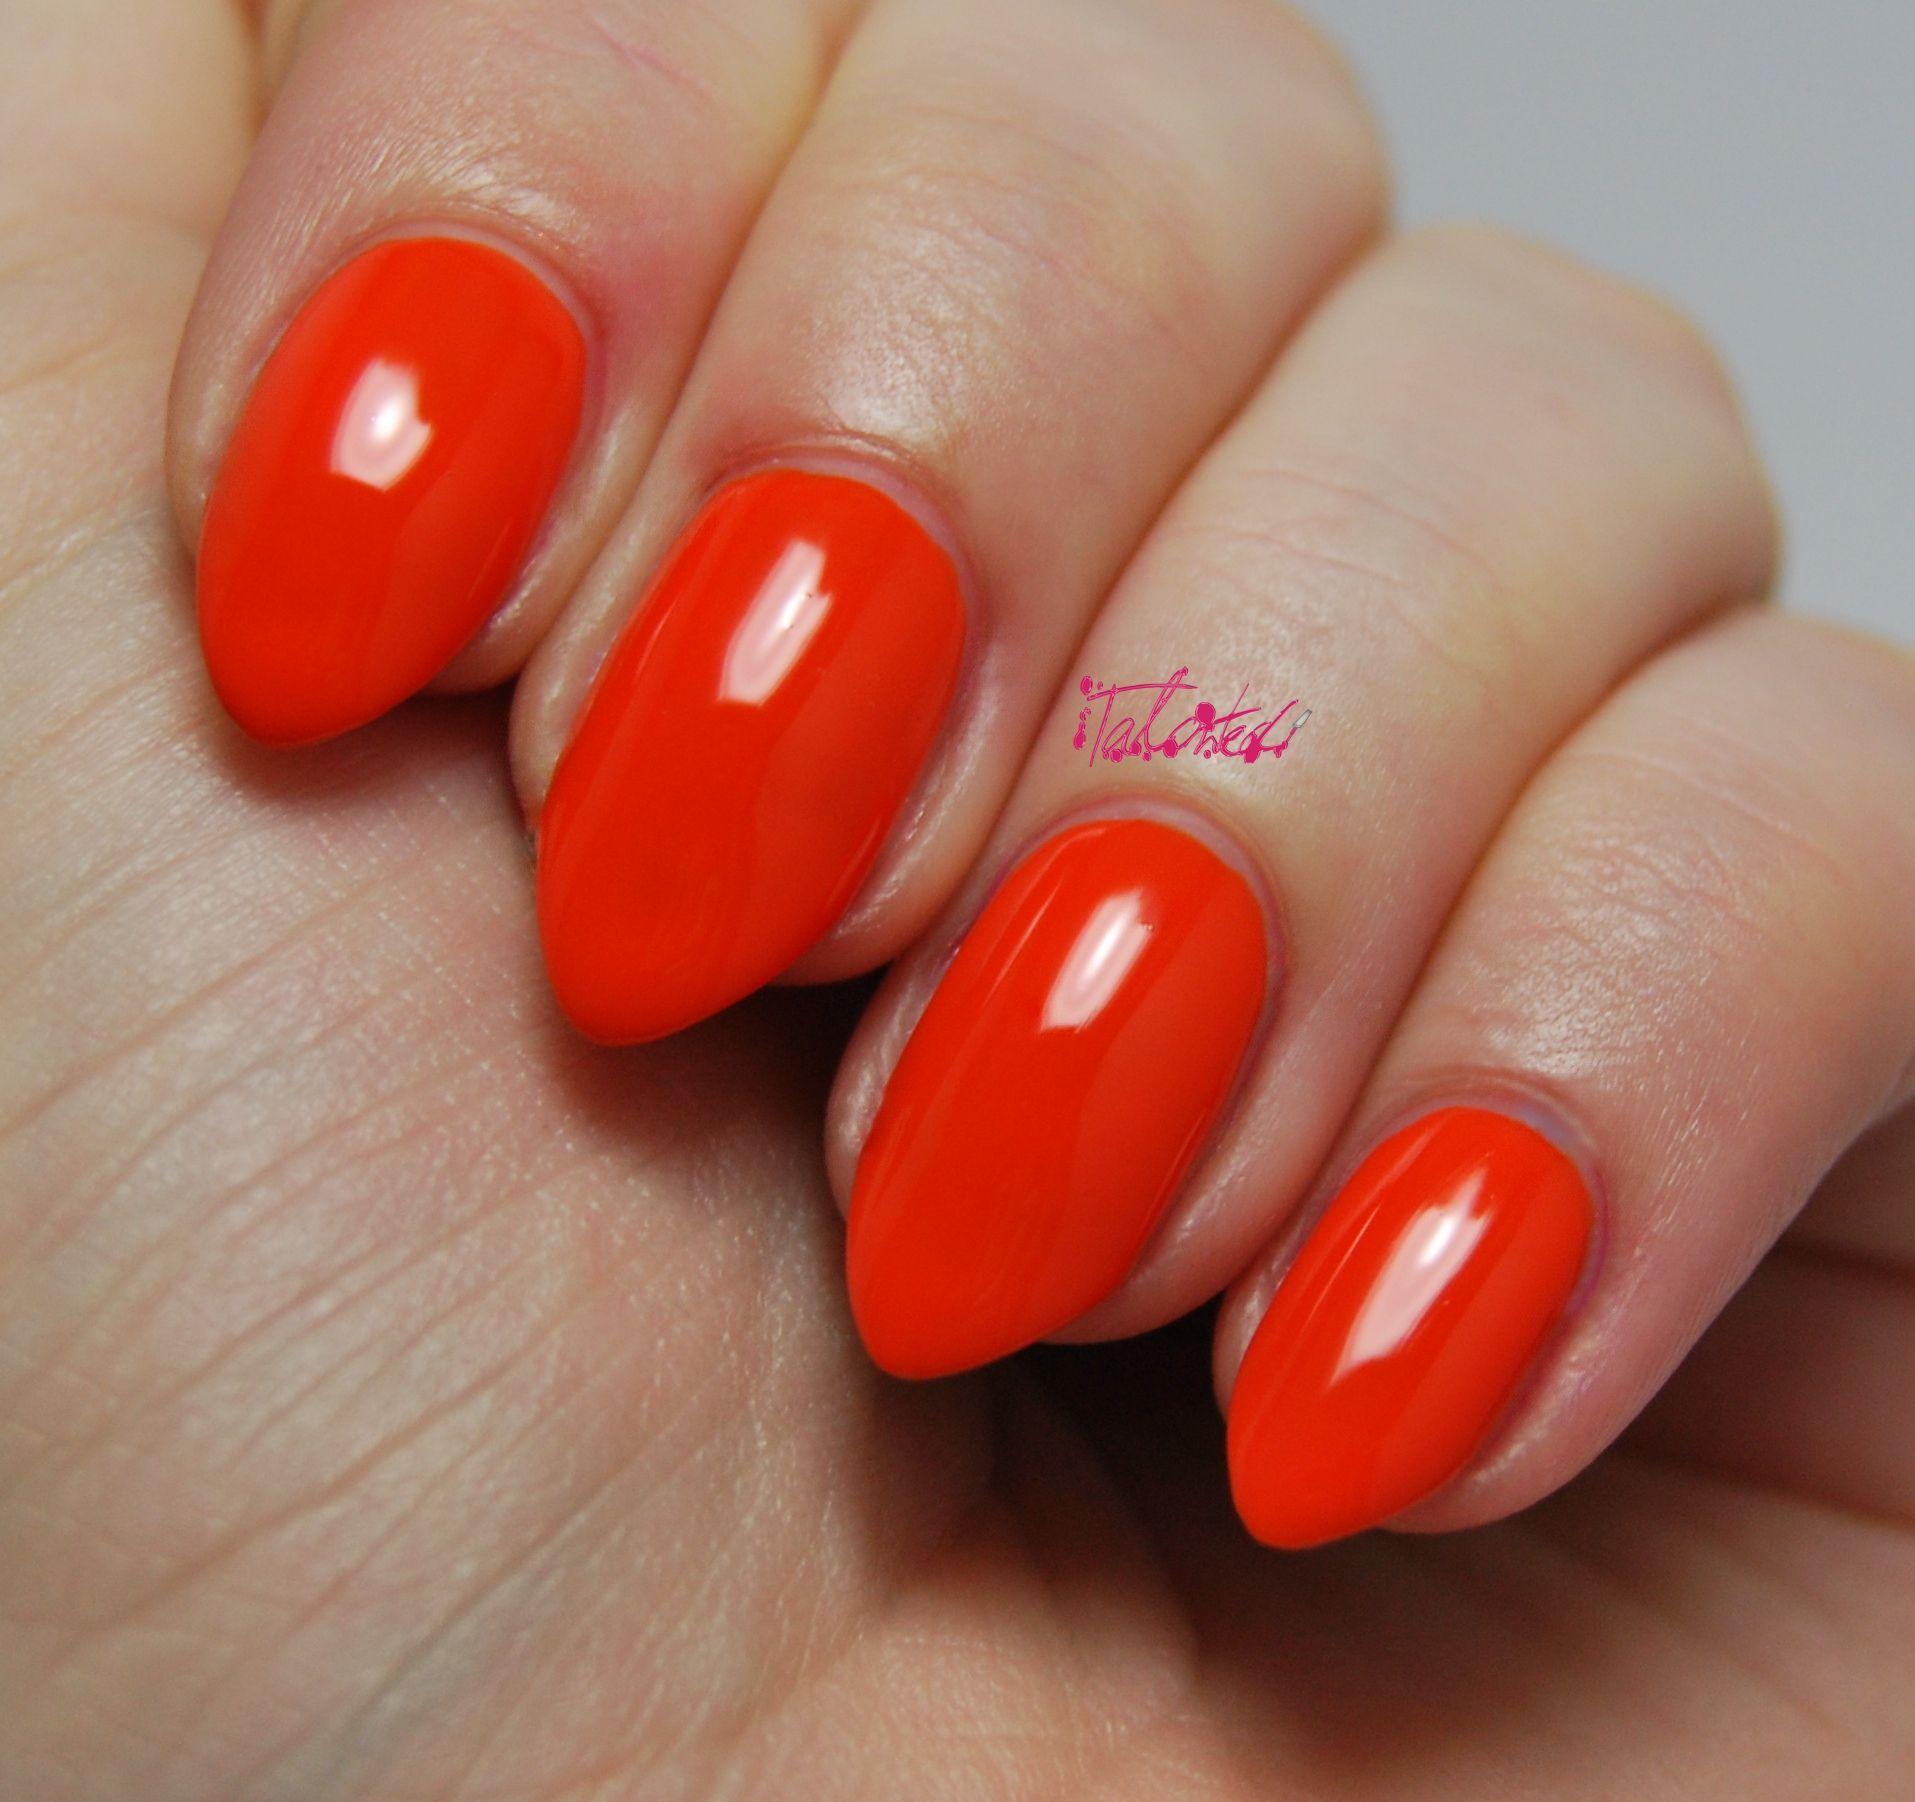 Essie fear desire review nail manicure manicure essie